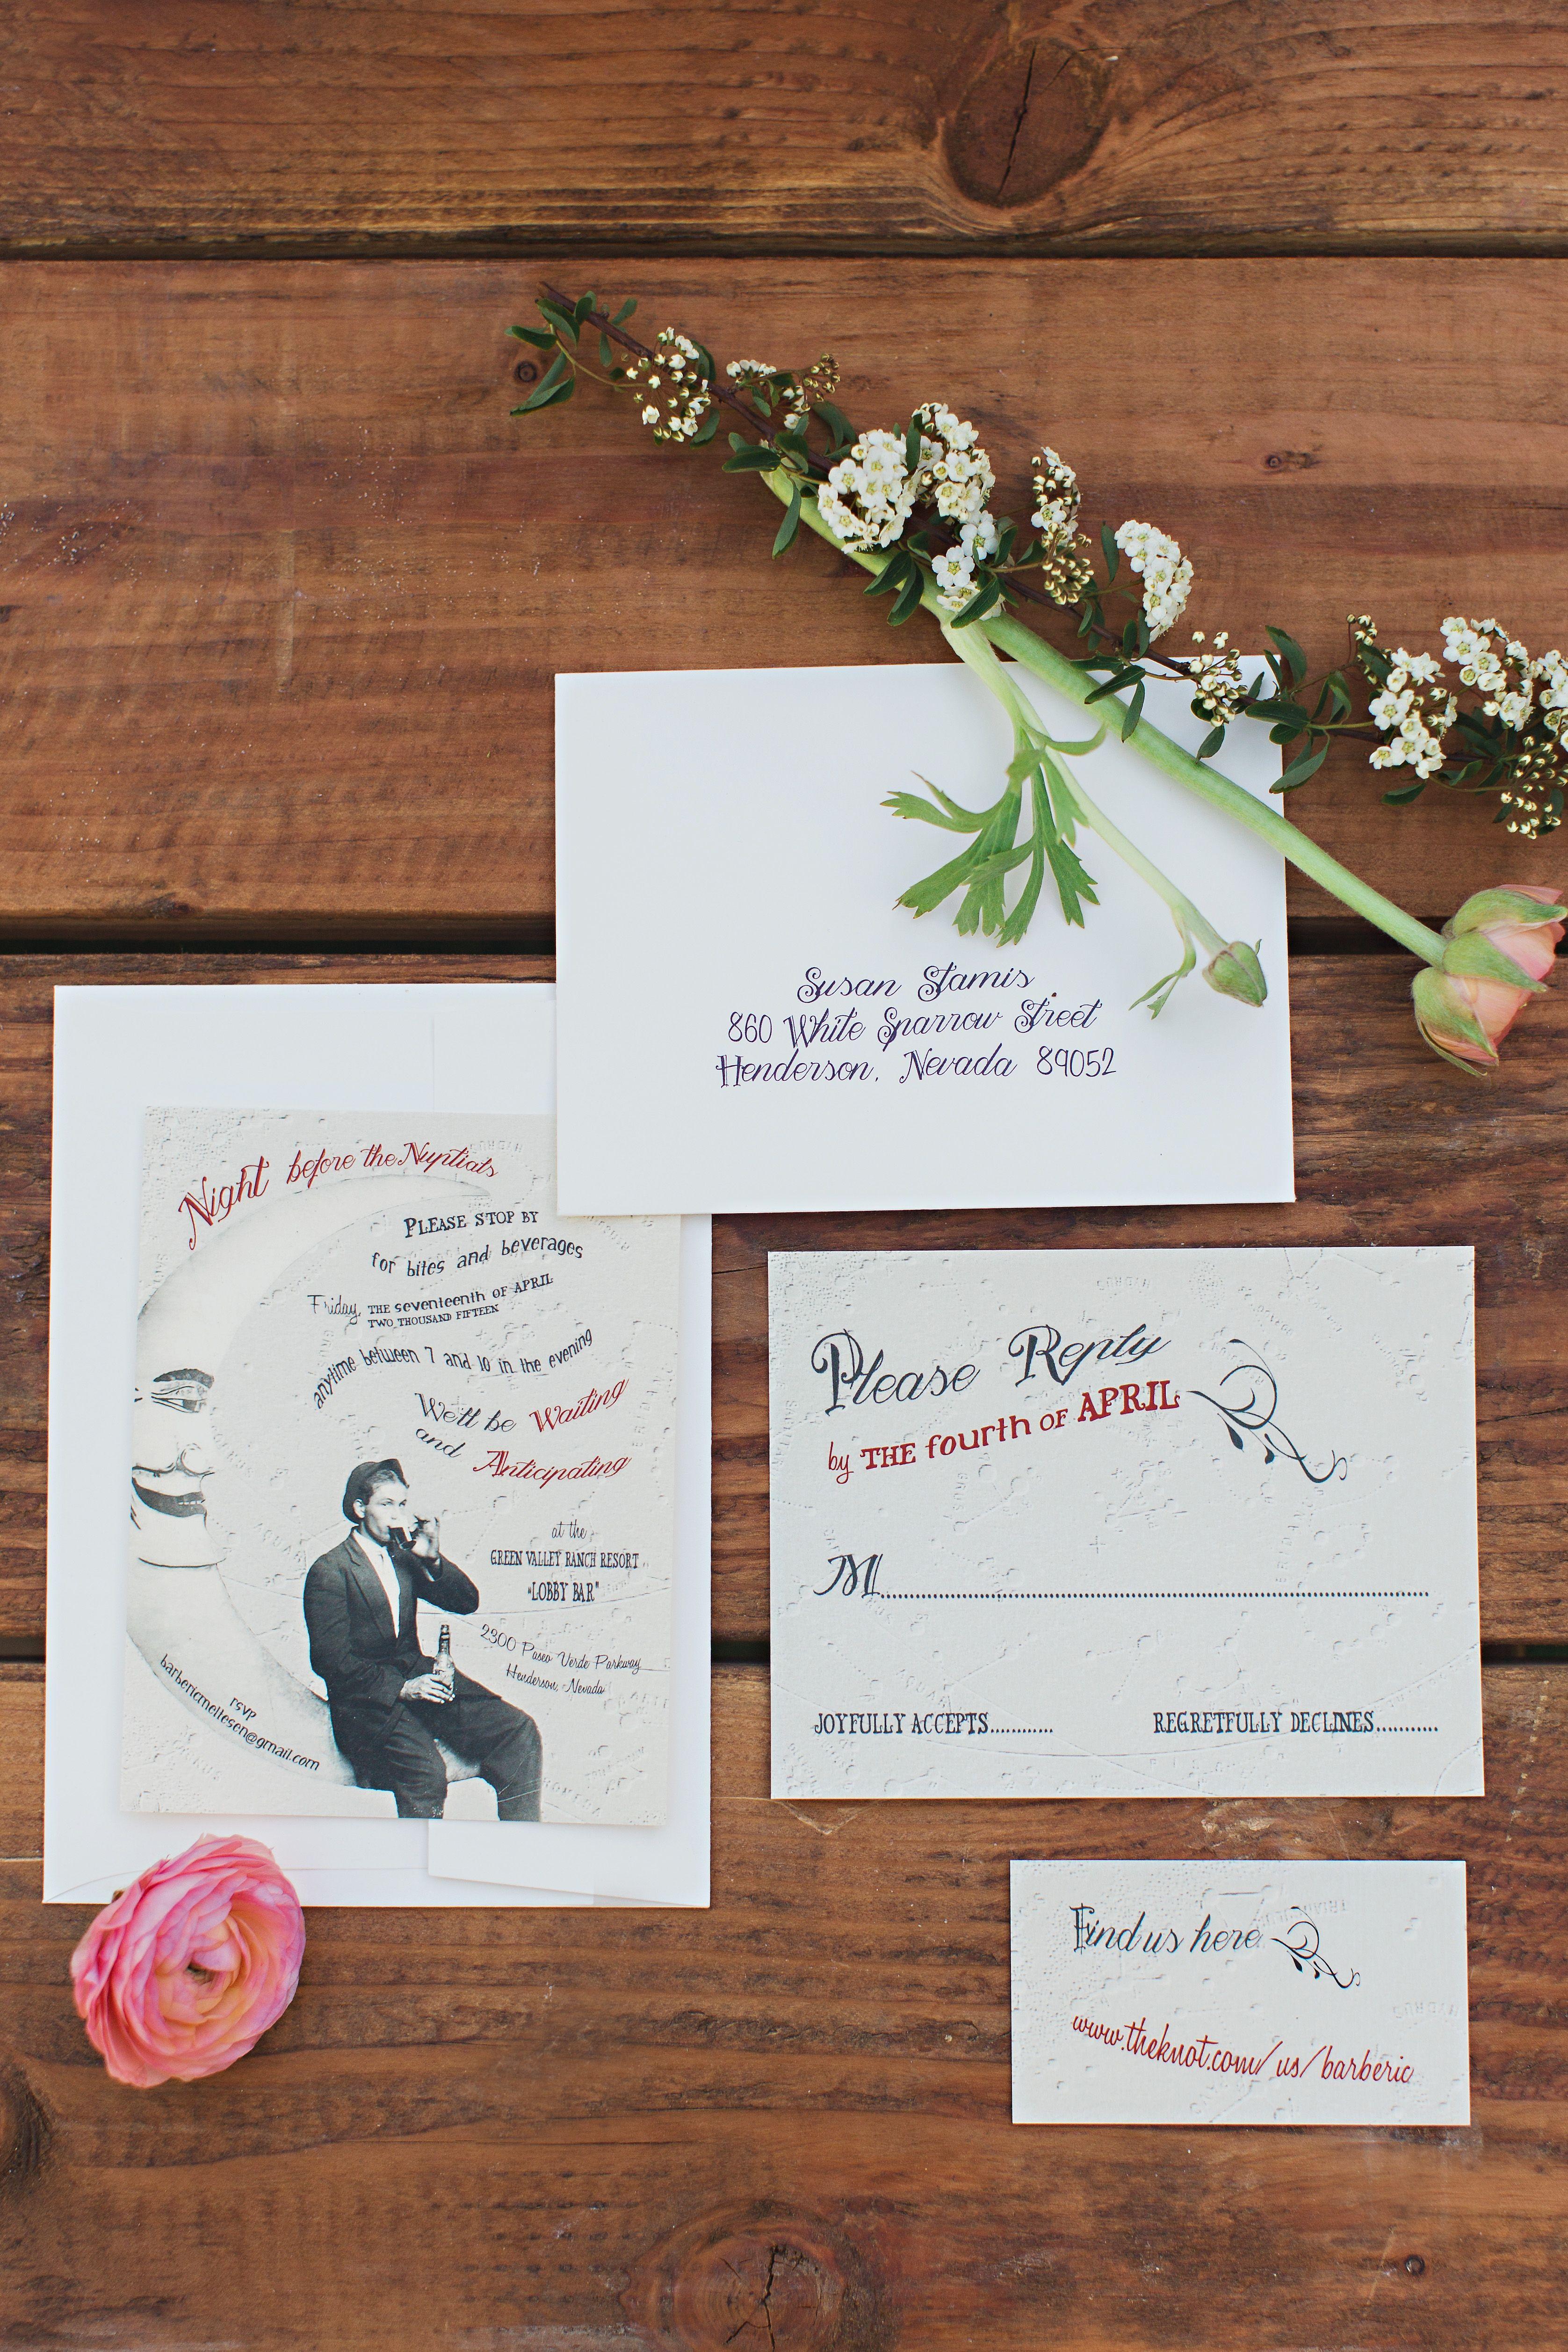 Mooninspired diy wedding invitations the future ez paper